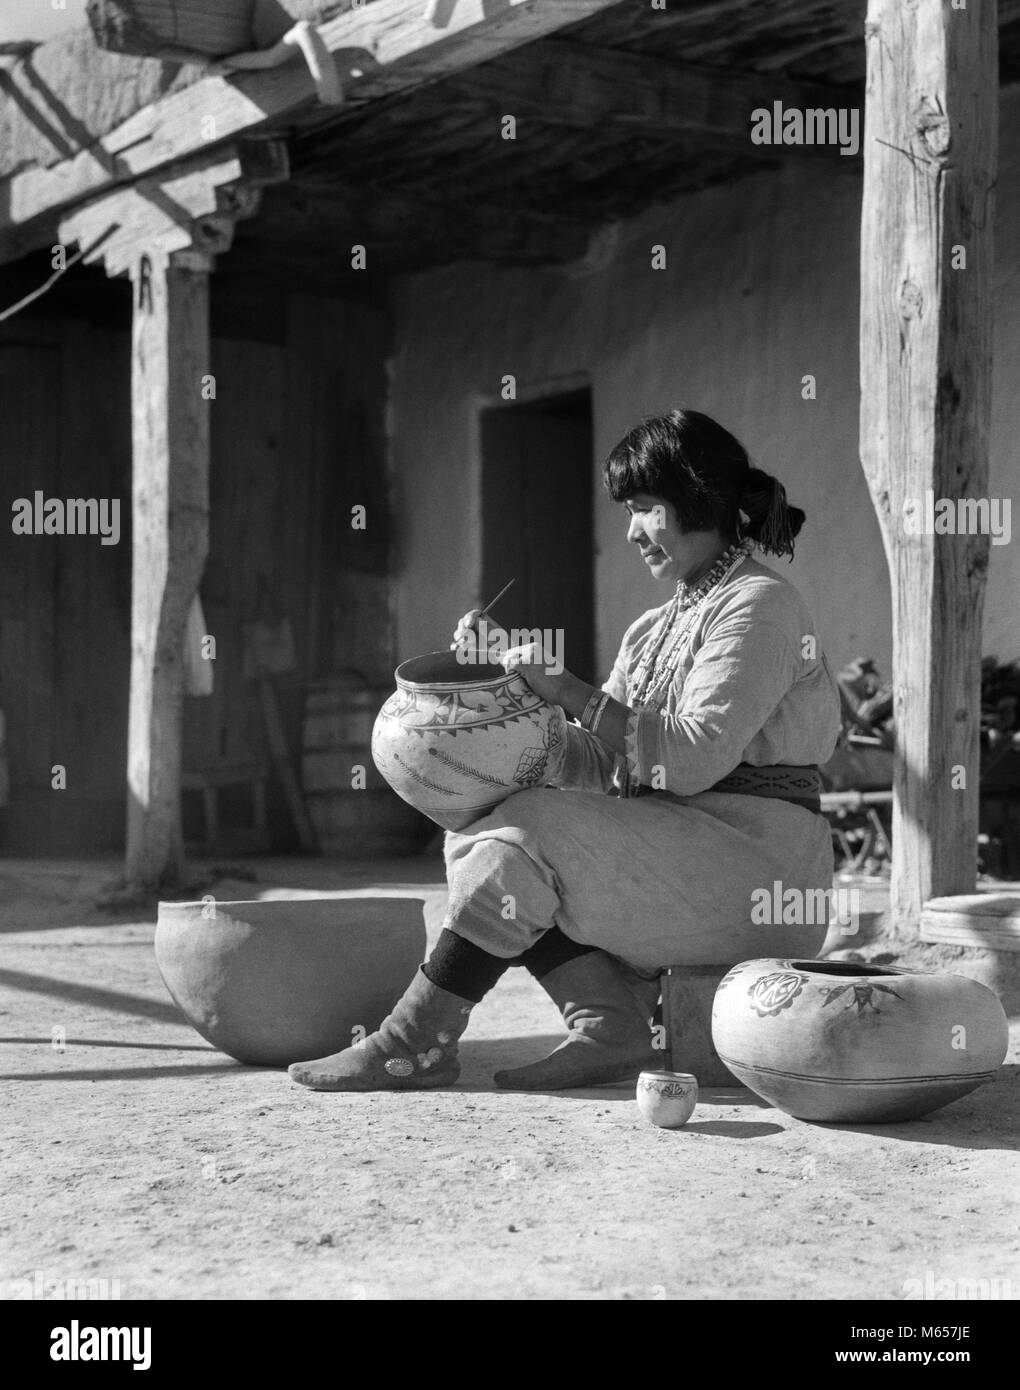 cochiti pueblo milf women Csvanw members employment csvanw's membership works aggressively to raise awareness about the public safety of native women and pueblo de cochiti.